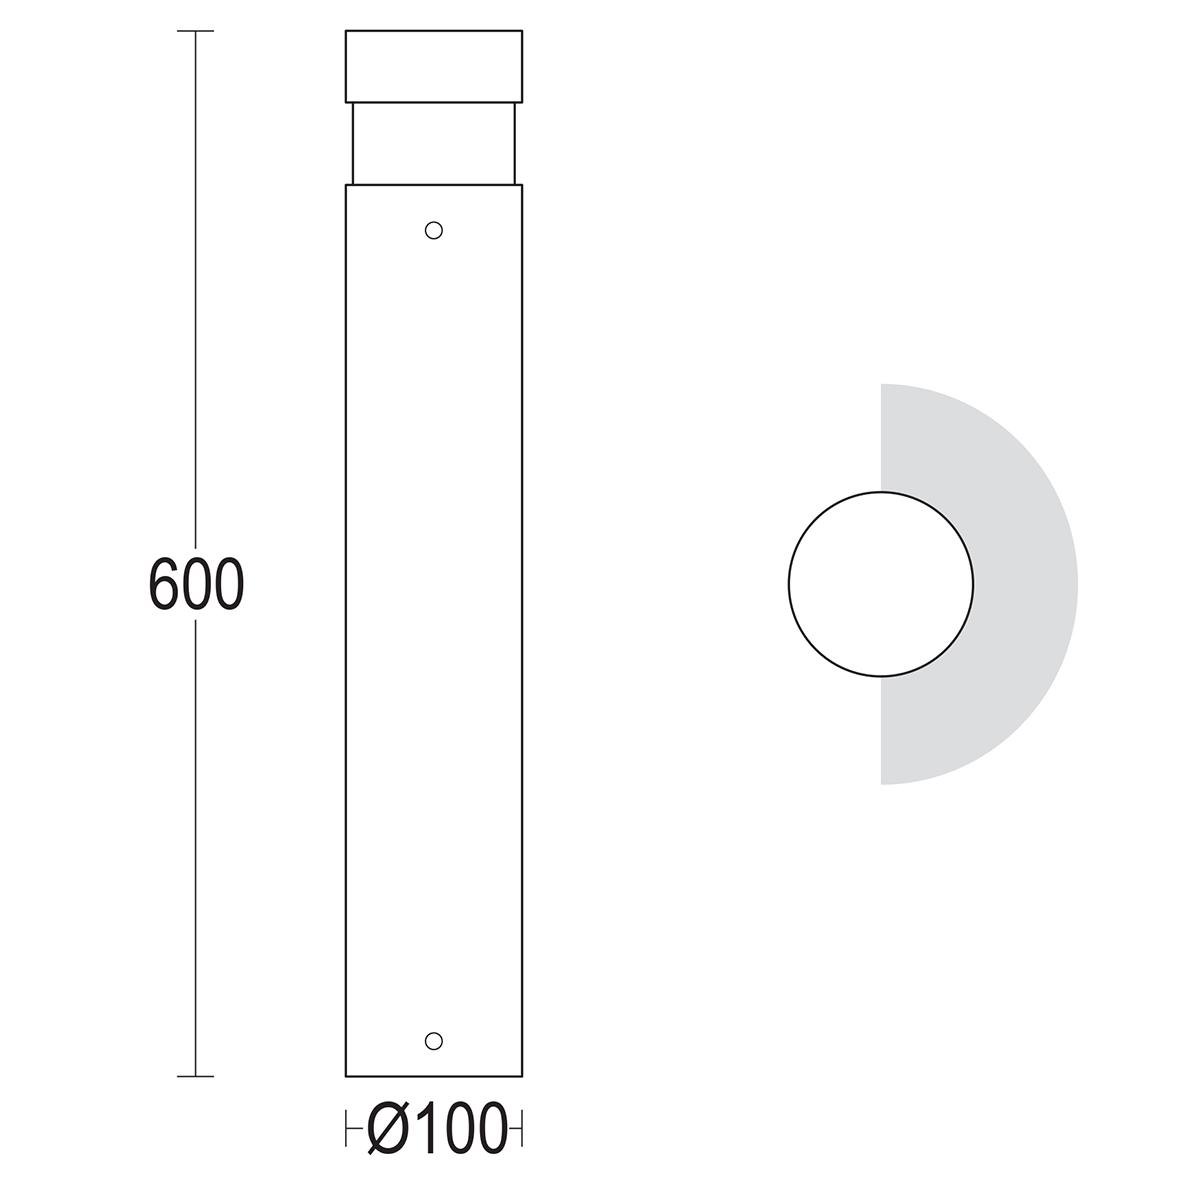 чертеж Tondo 600 Ghidini уличный светильник GH1445.LVXT300EN